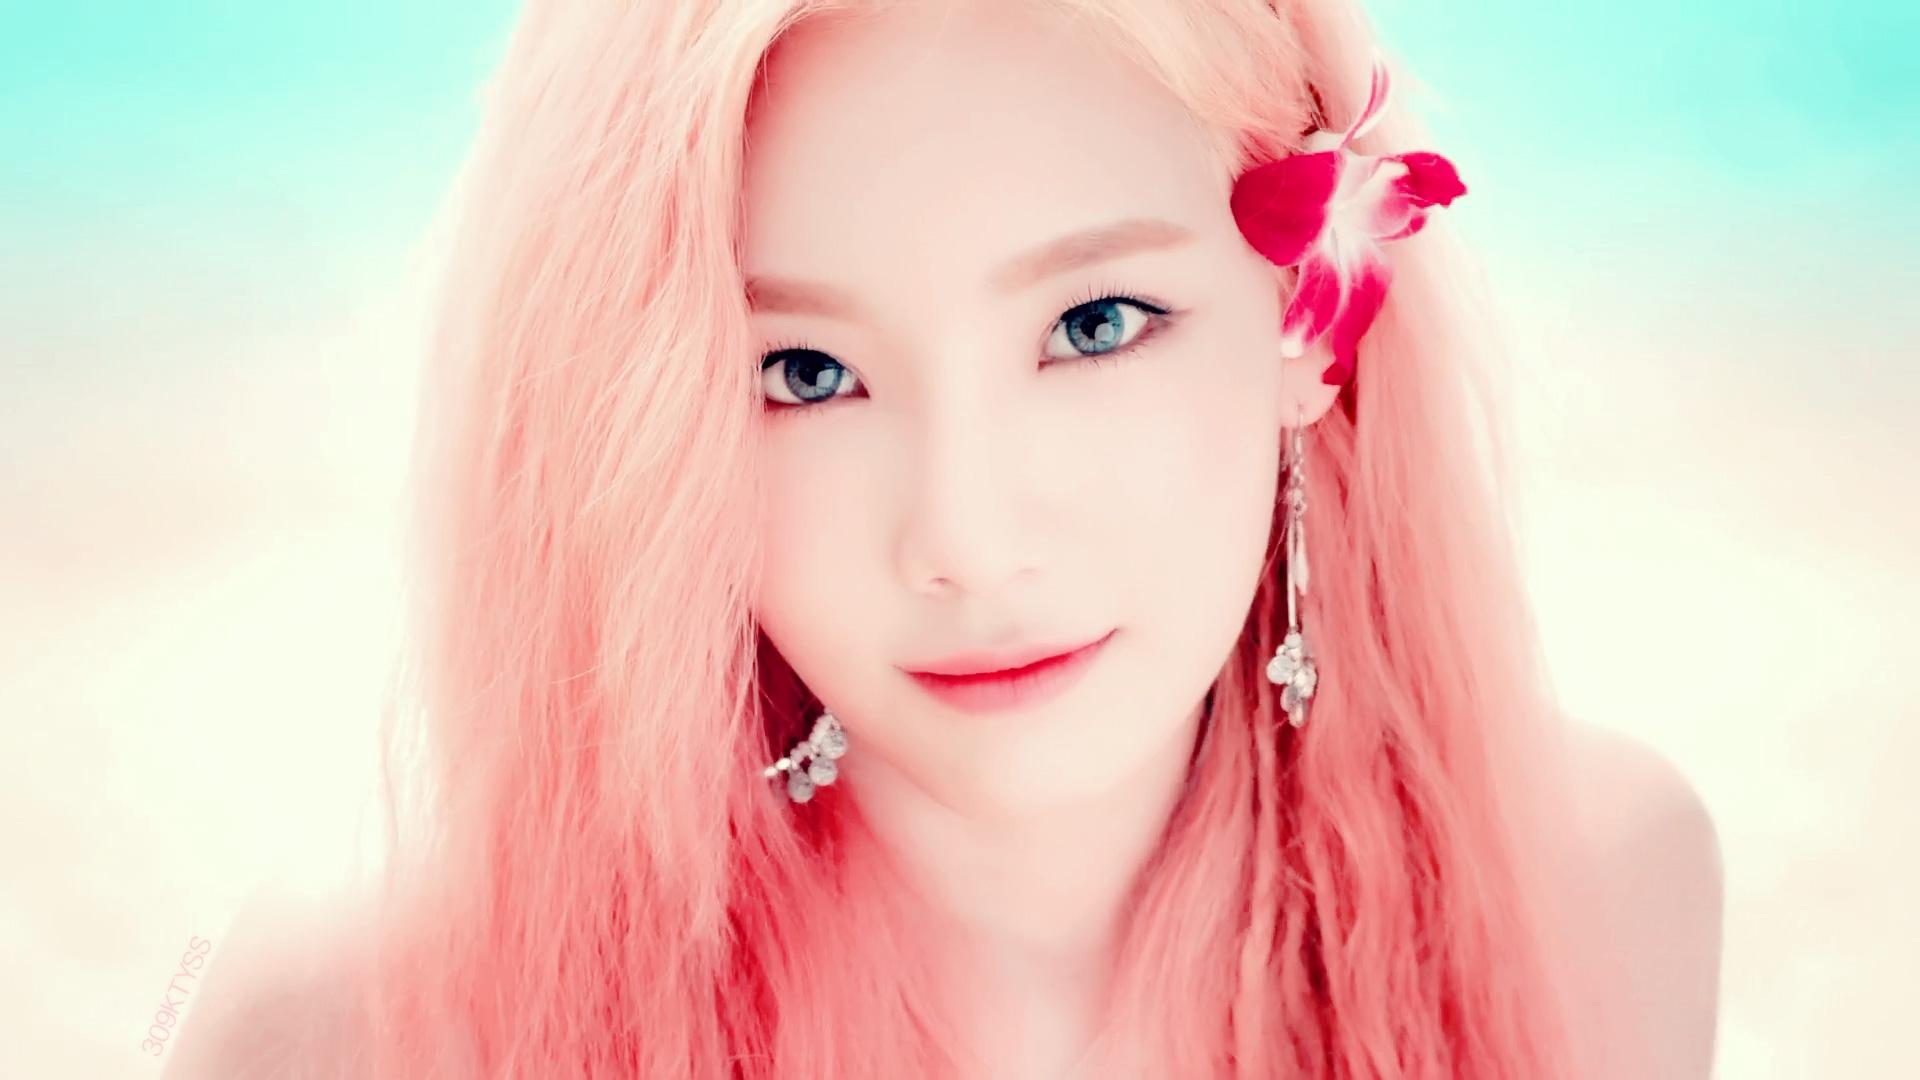 Taeyeon Cute Wallpaper Taeyeon Sweet Wallpaper ☺ Snsd Nostalgic Party Teaser1920